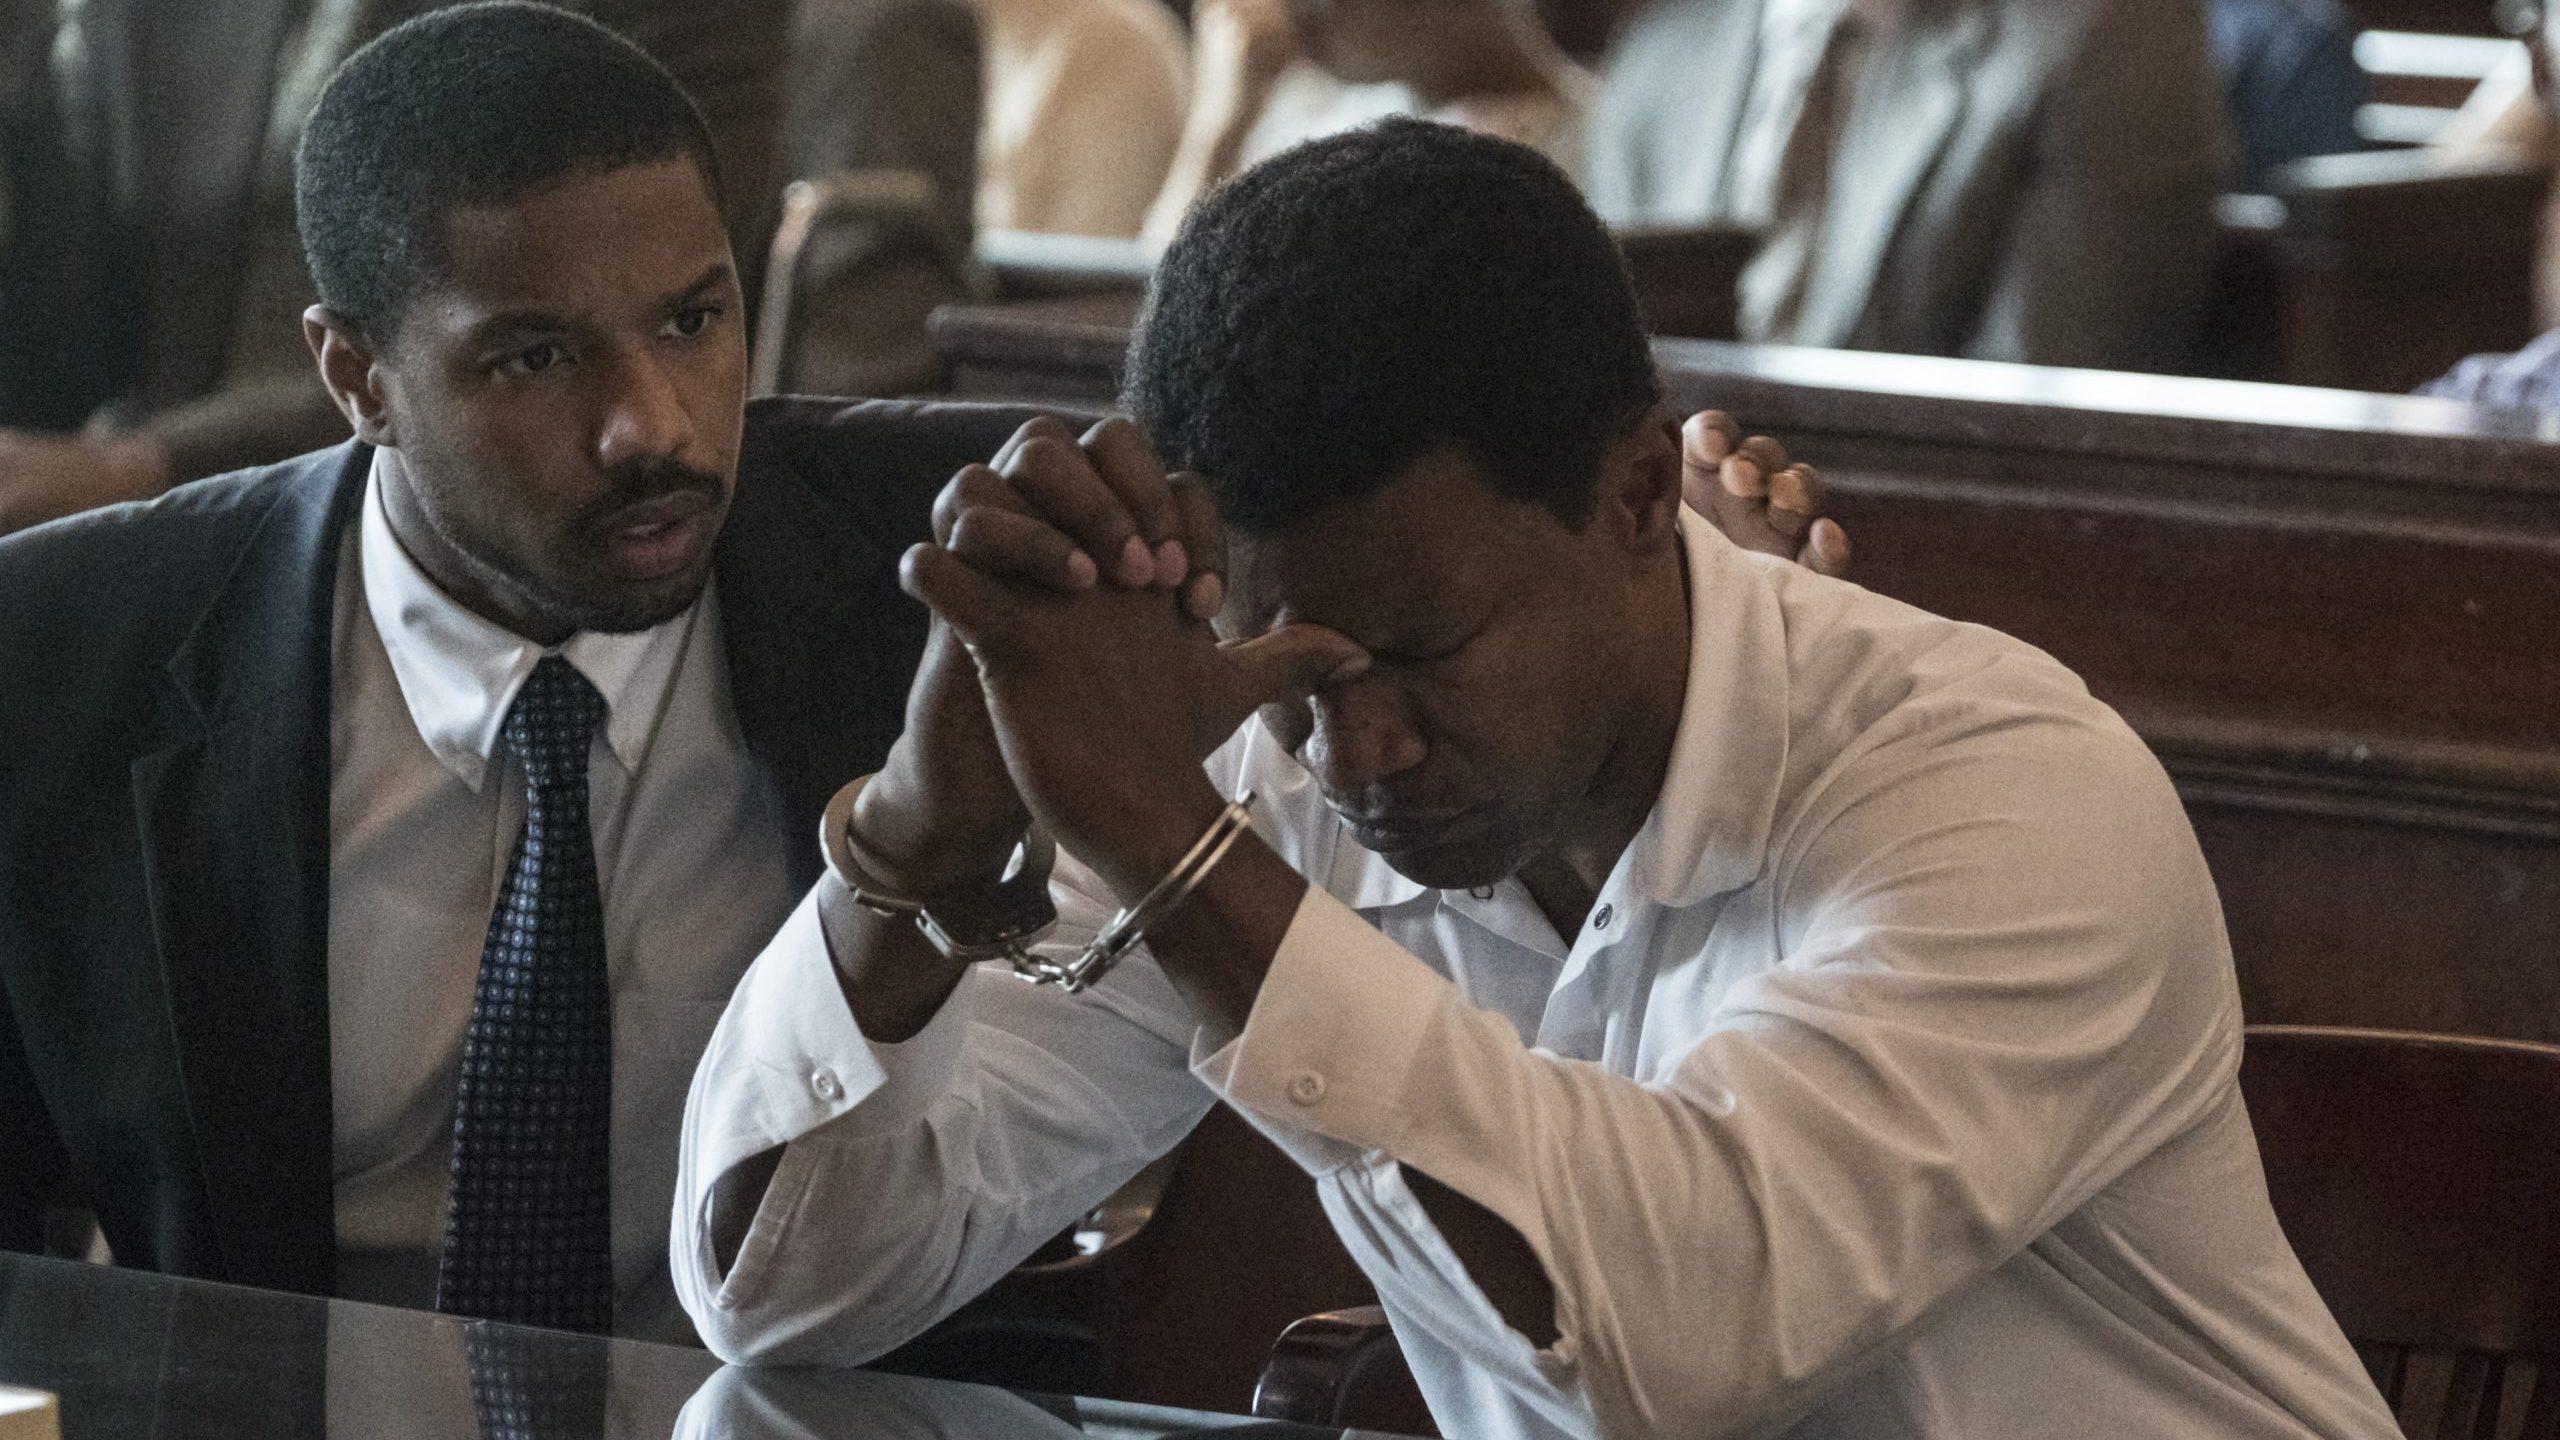 Death penalty foes applaud Just Mercy Angelus News 2560x1440